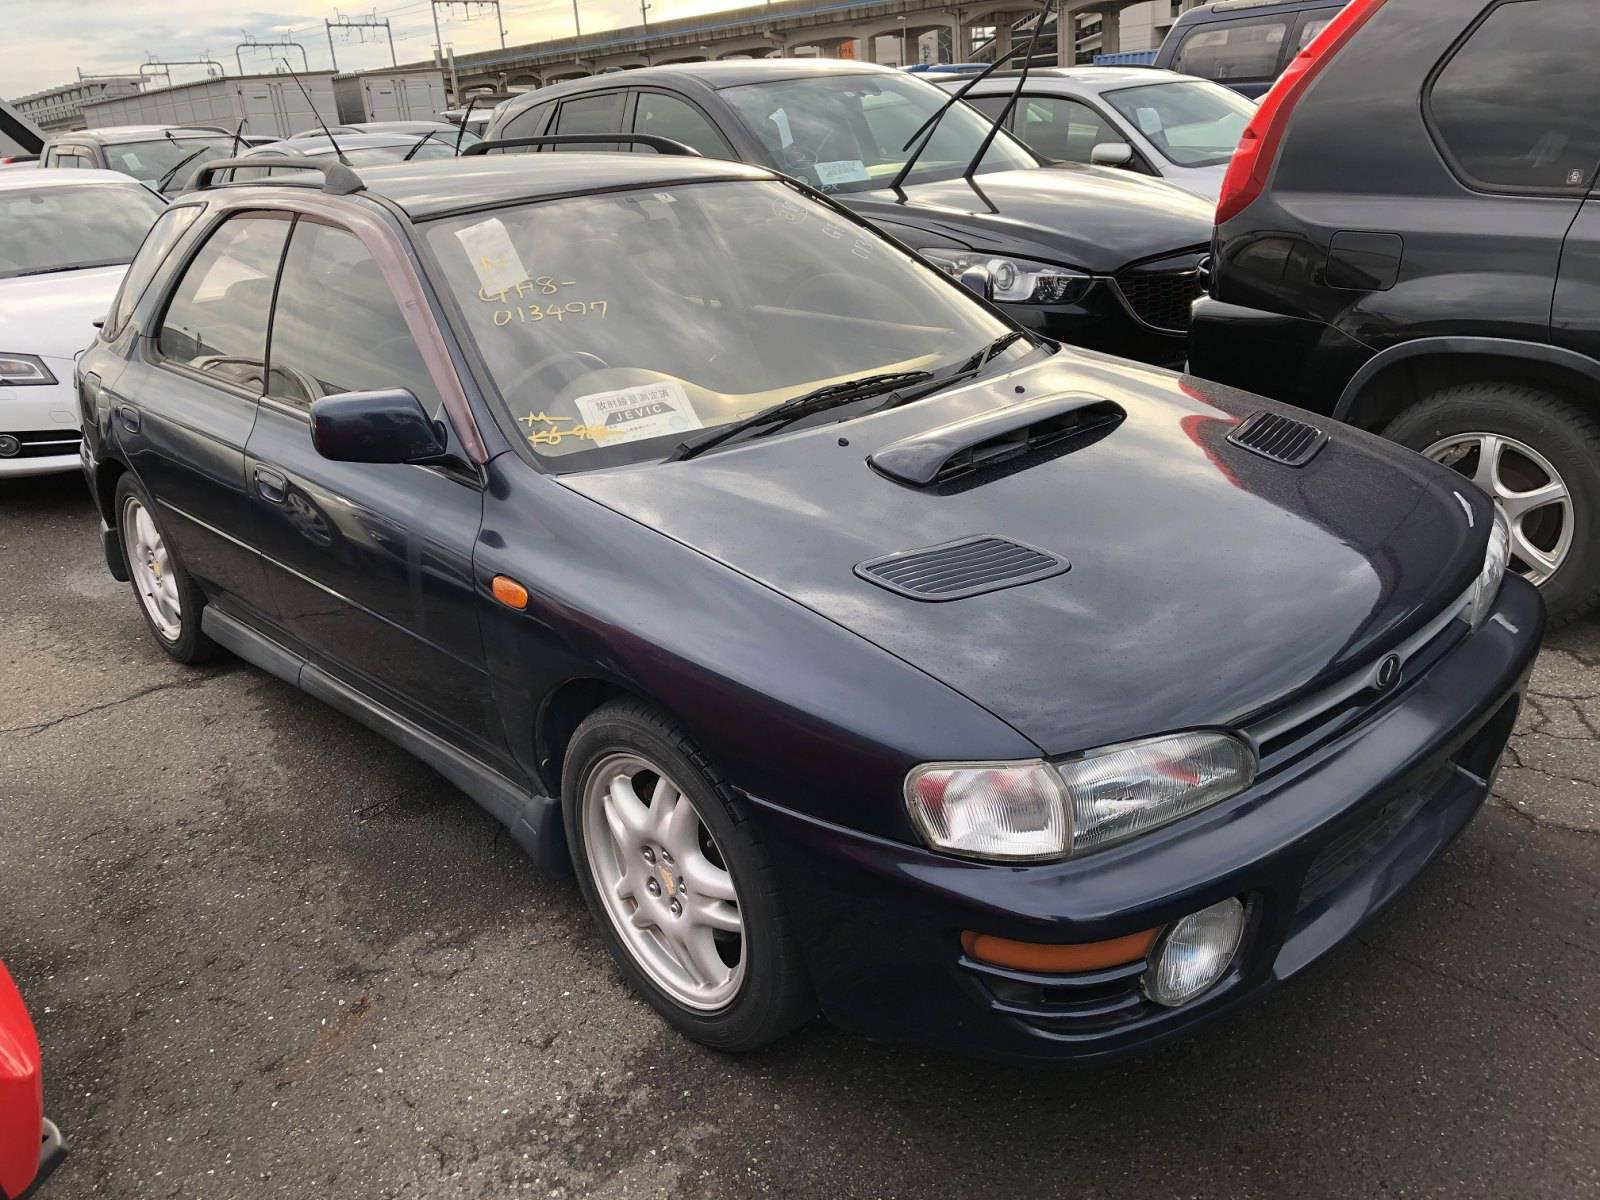 1995 Subaru Impreza Wrx Sport Wagon Arriving Late November Jdmbuysell Com